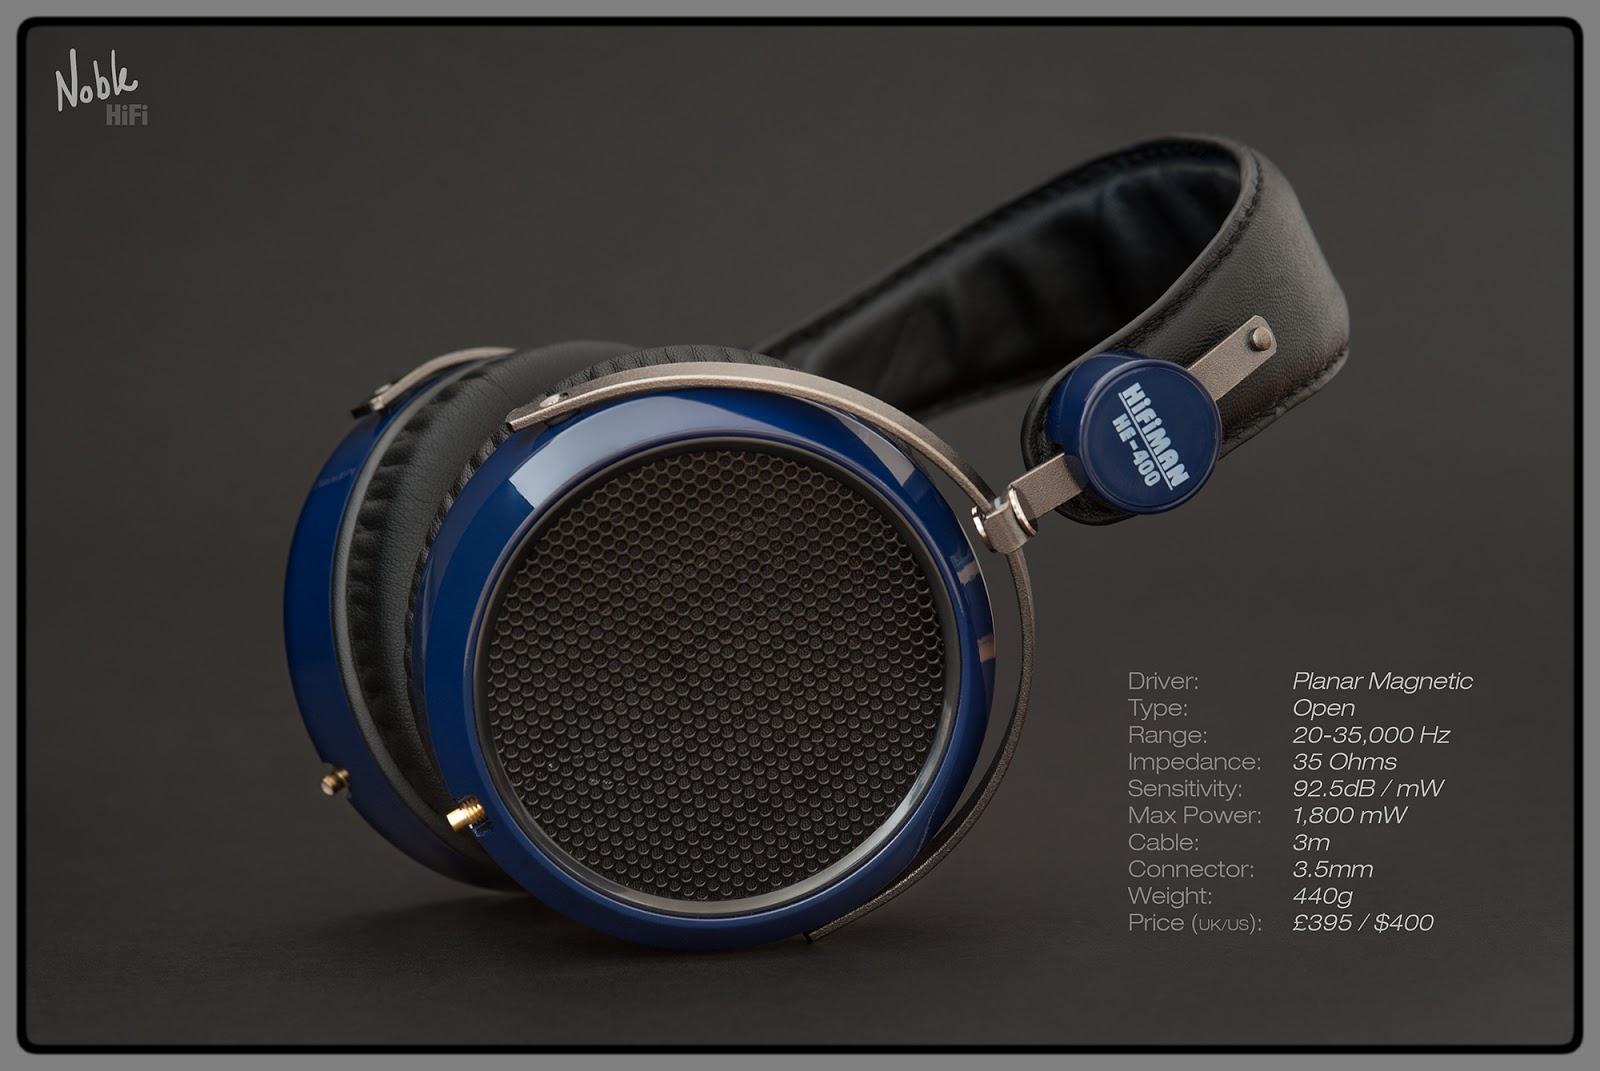 HIFIMAN Black Replacement Focus Ear Pads For HE400i//HE500// HE6//HE-5LE Headphones